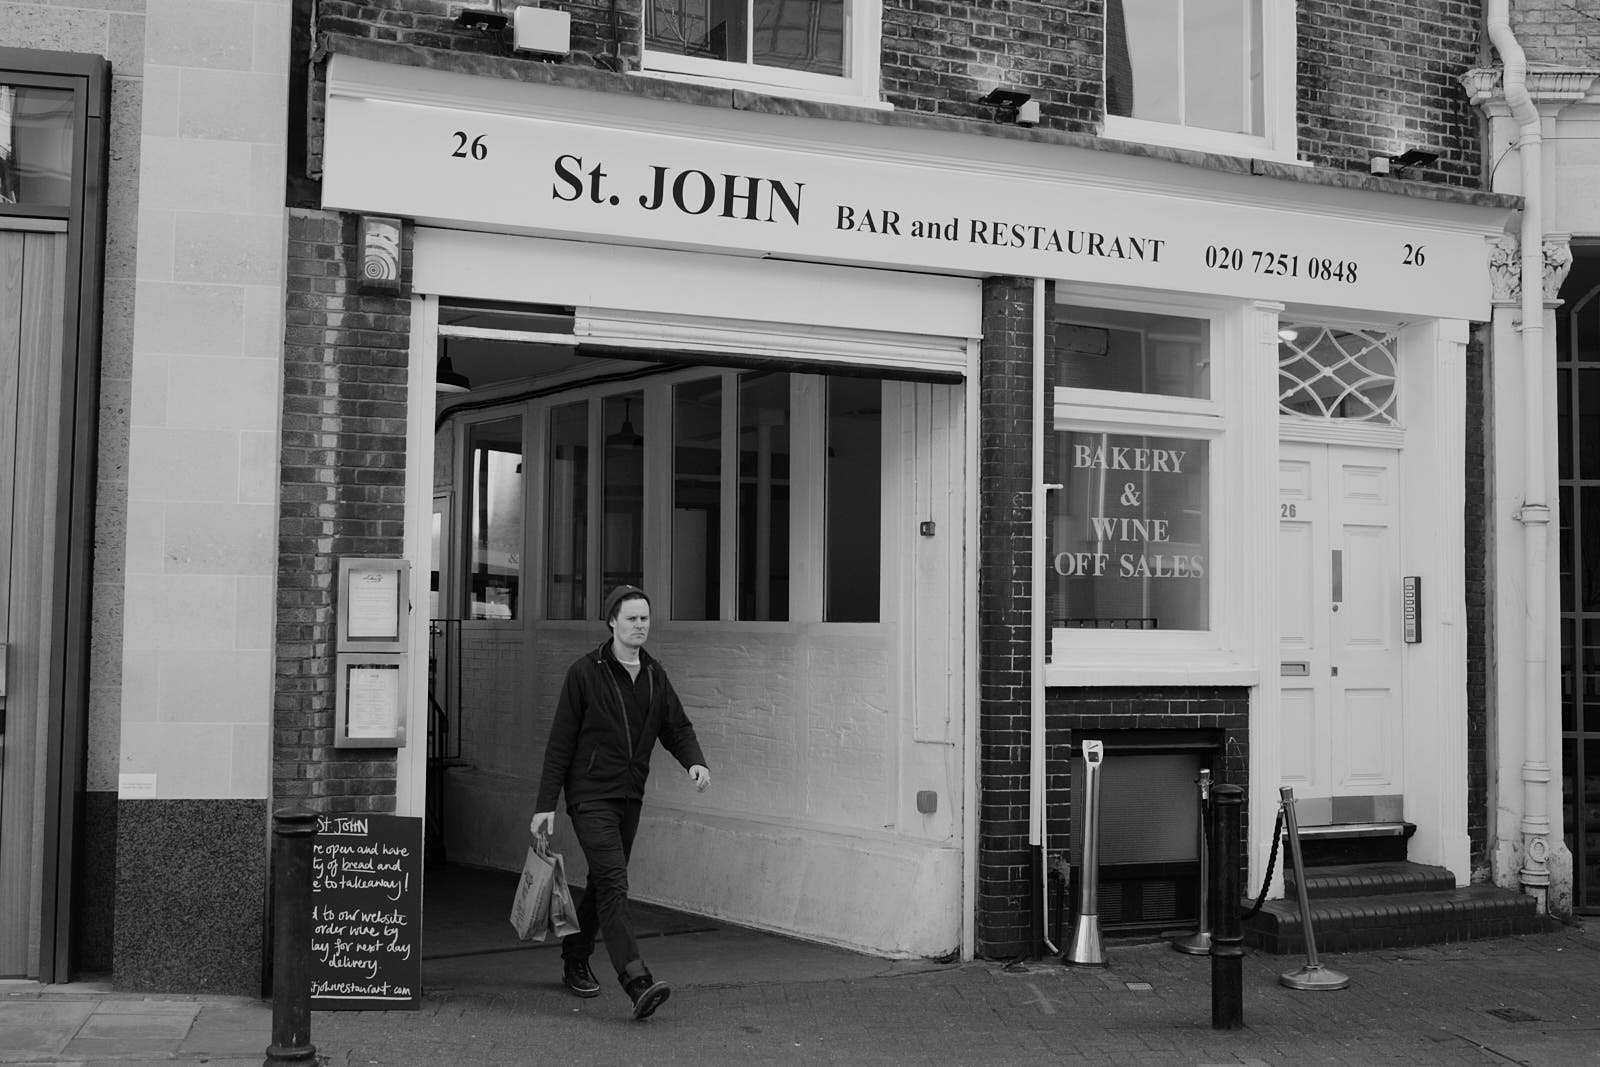 U.K. coronavirus lockdown will reopen restaurants and pubs like London restaurant St. John last, says Michael Gove